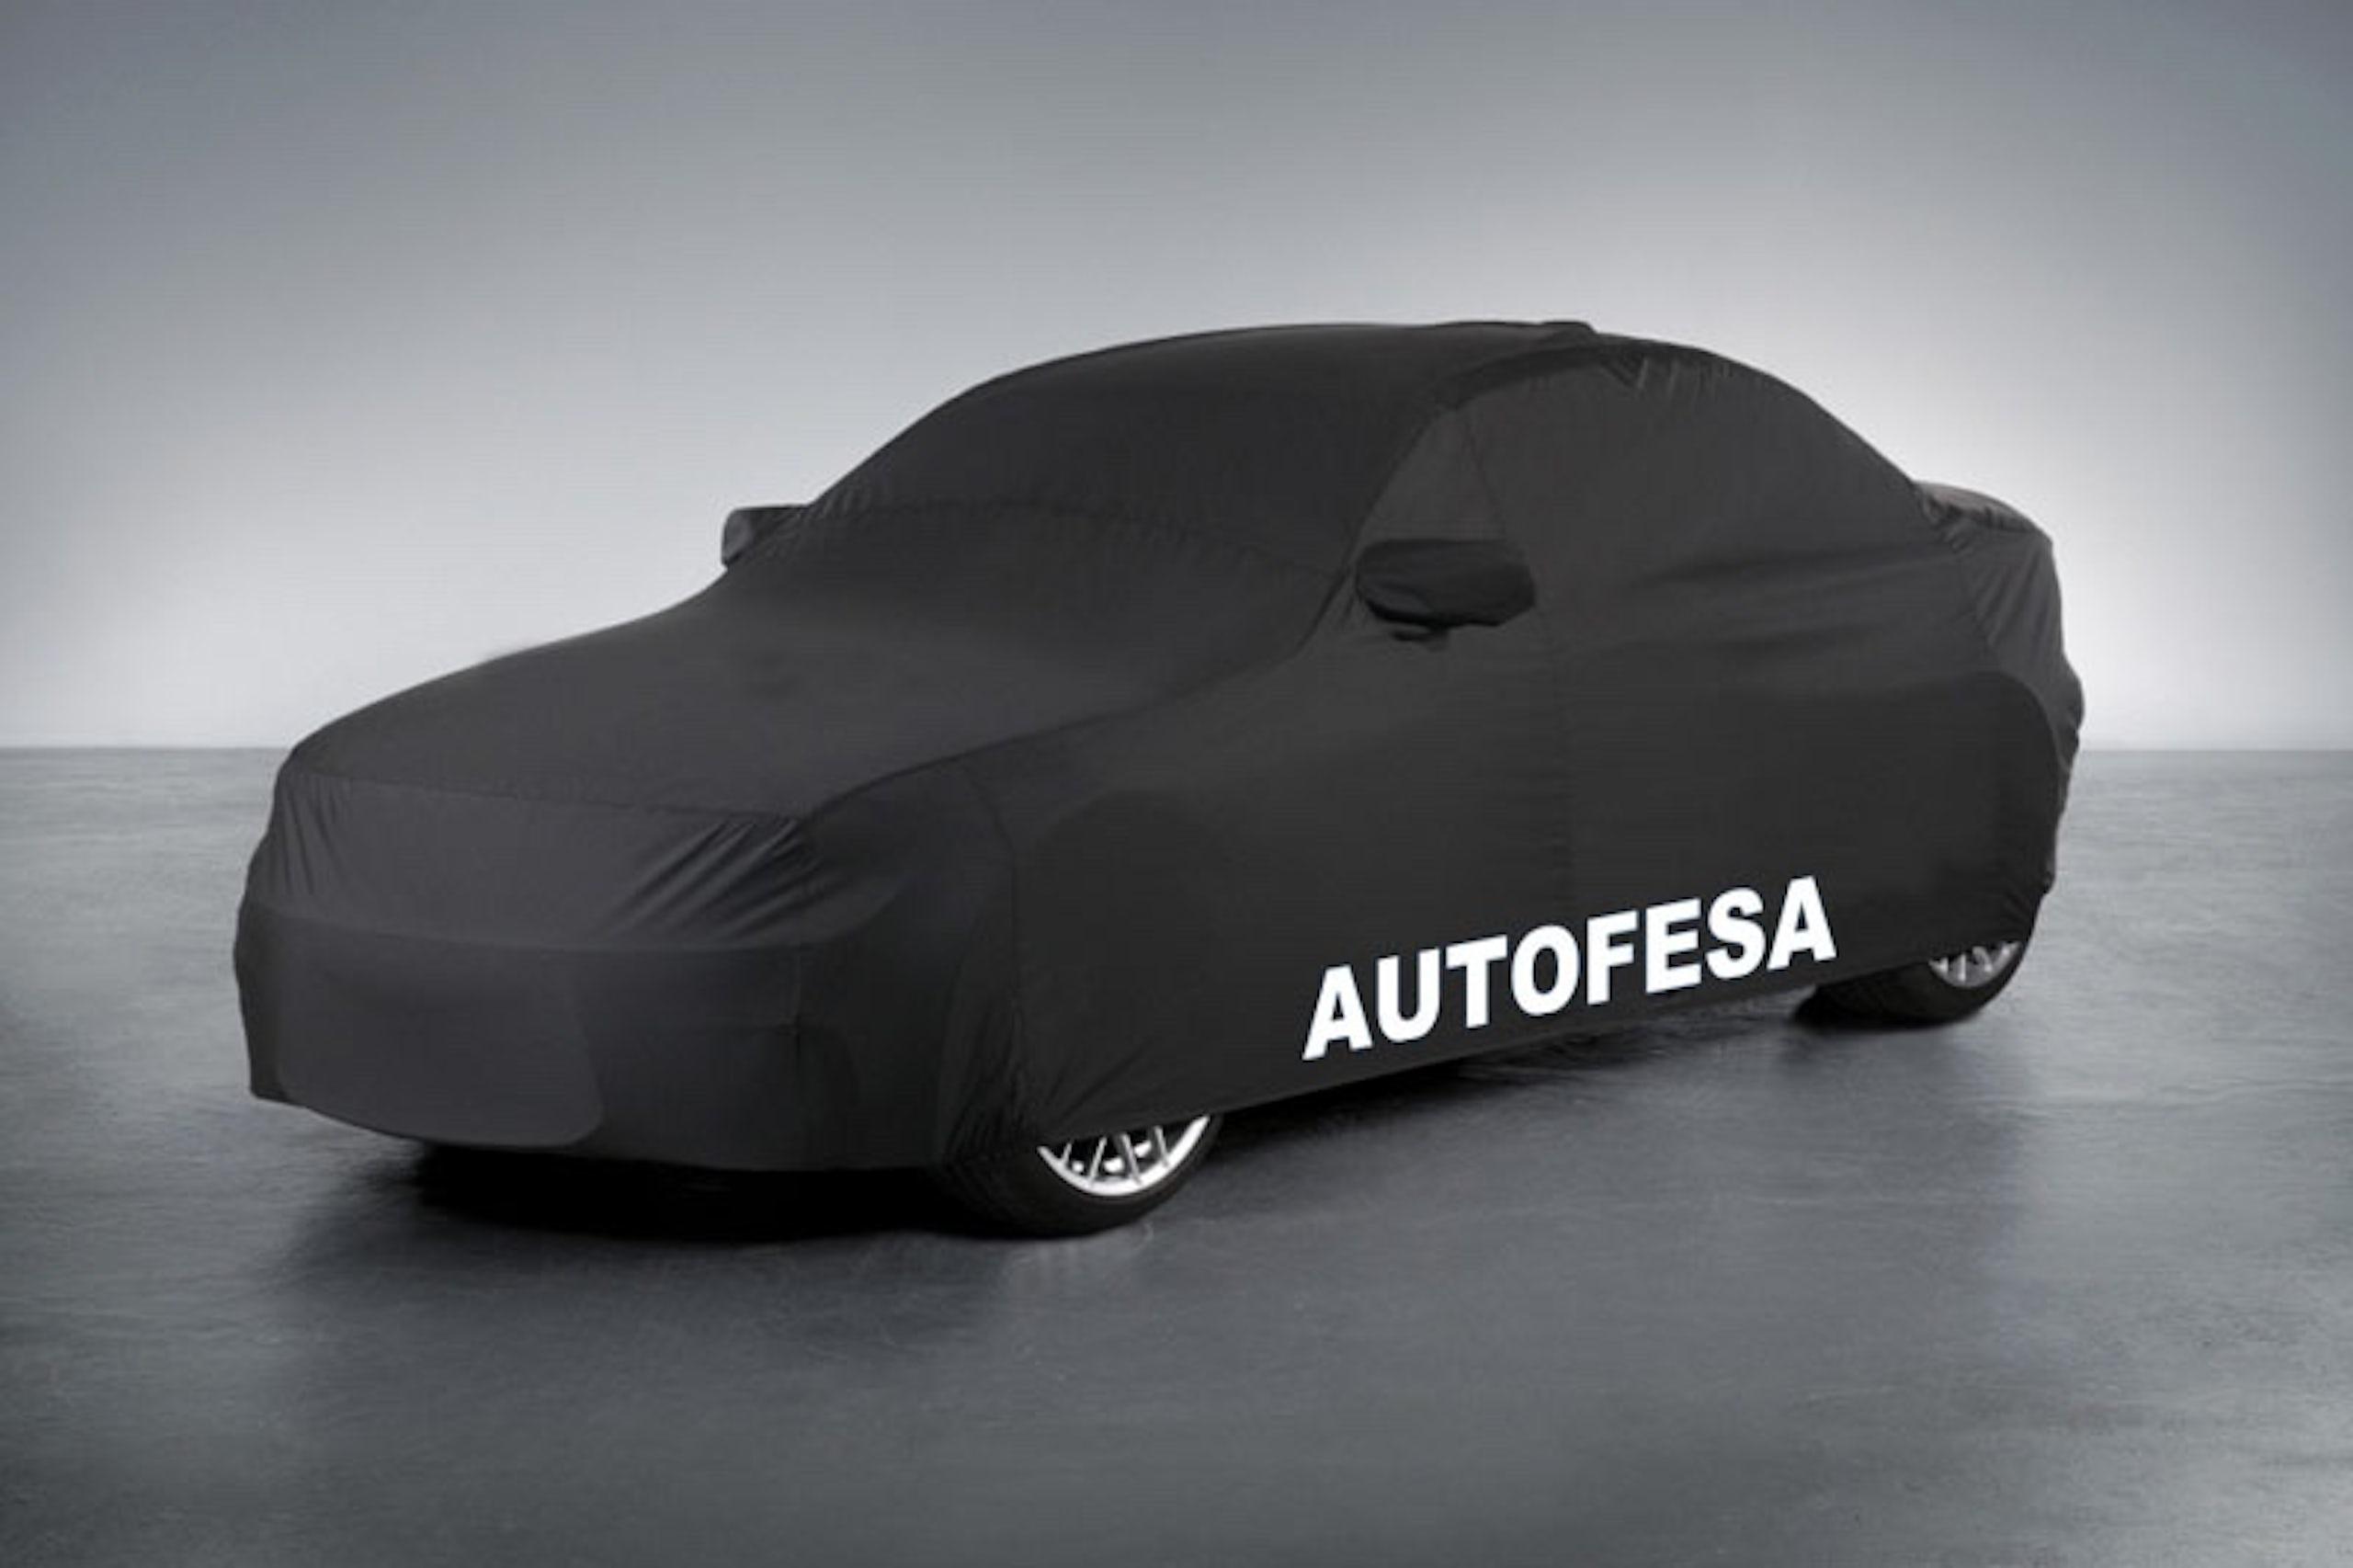 Mitsubishi Outlander 2.0 DI-D 150cv Motion 2WD 5p 7plz Auto S/S - Foto 2